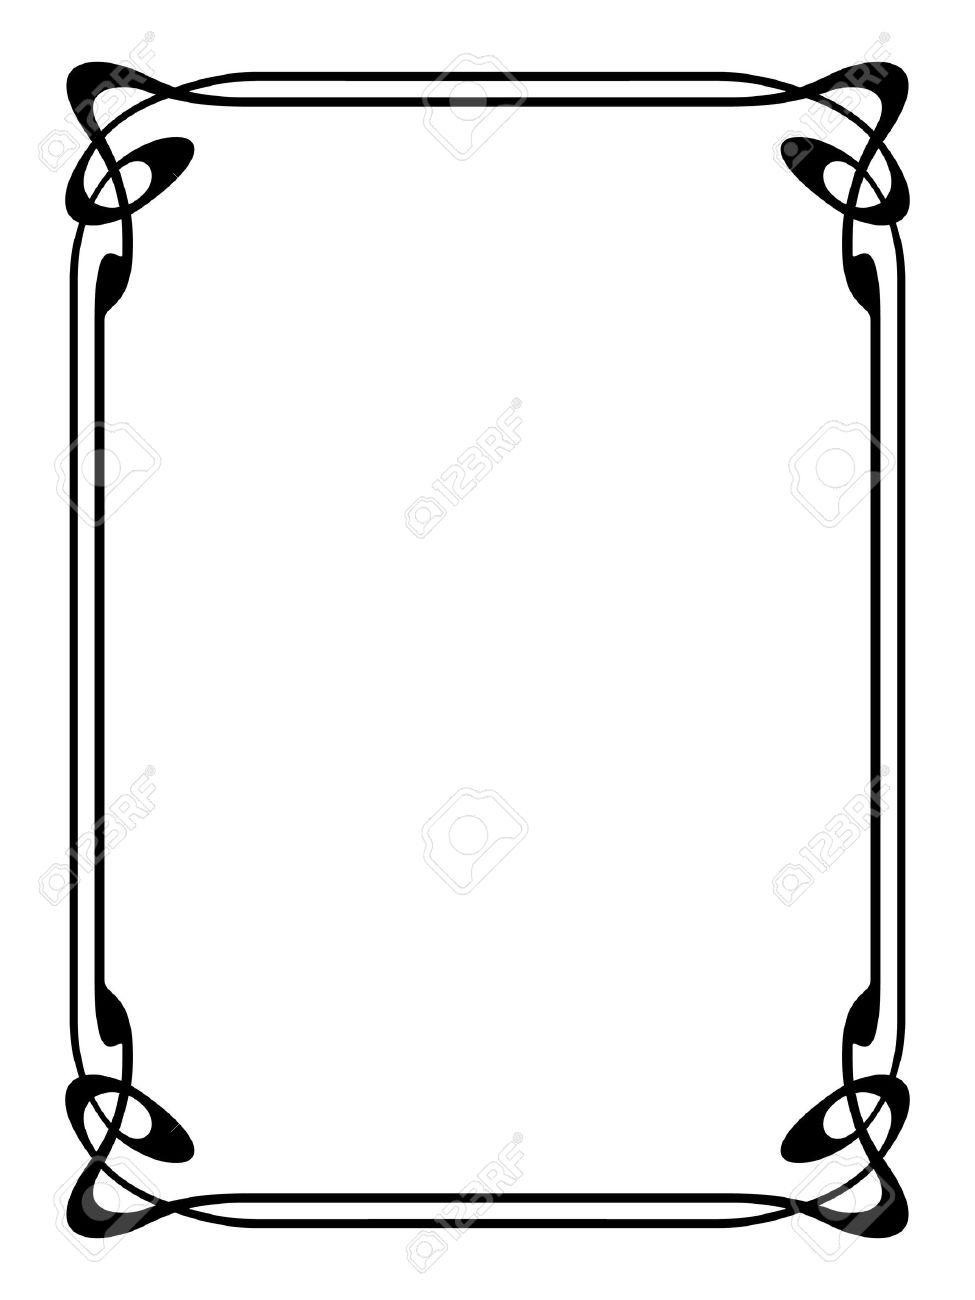 Card Corner Border Designs Clipart | Free download best Card Corner ...